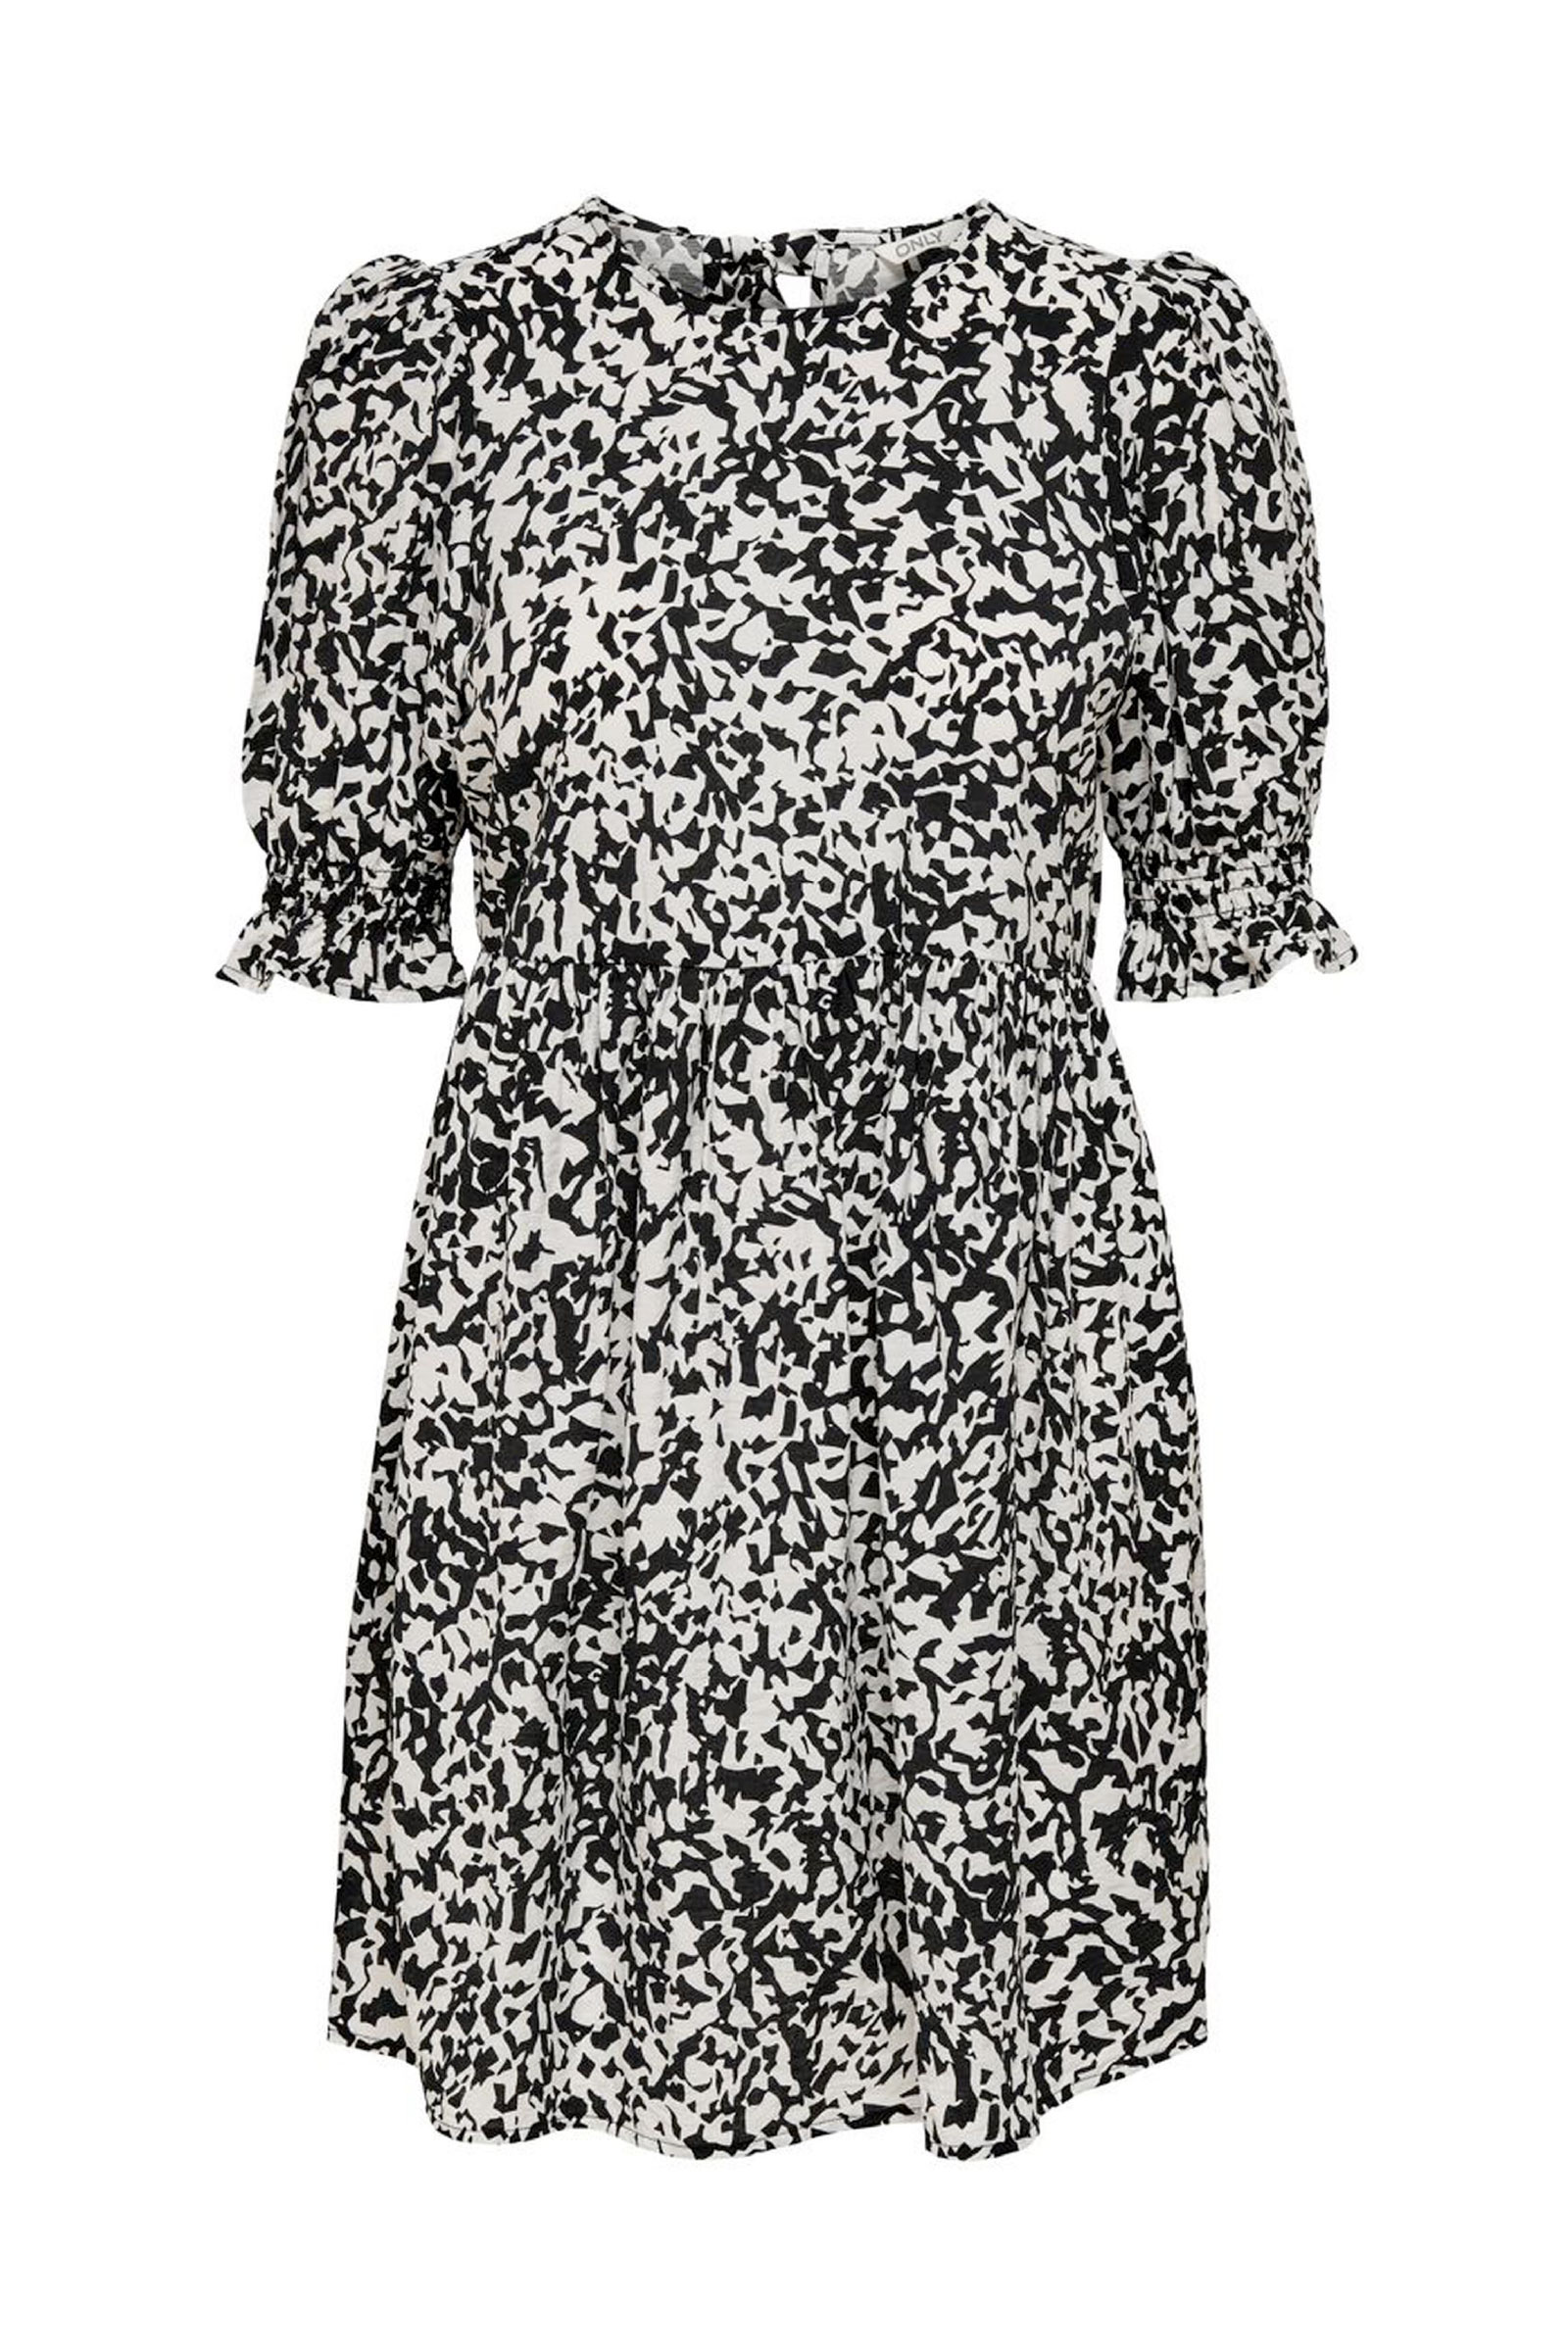 ONLY vestito Donna ONLY | Vestito | 15221268AOP-CITY GRAPHIC